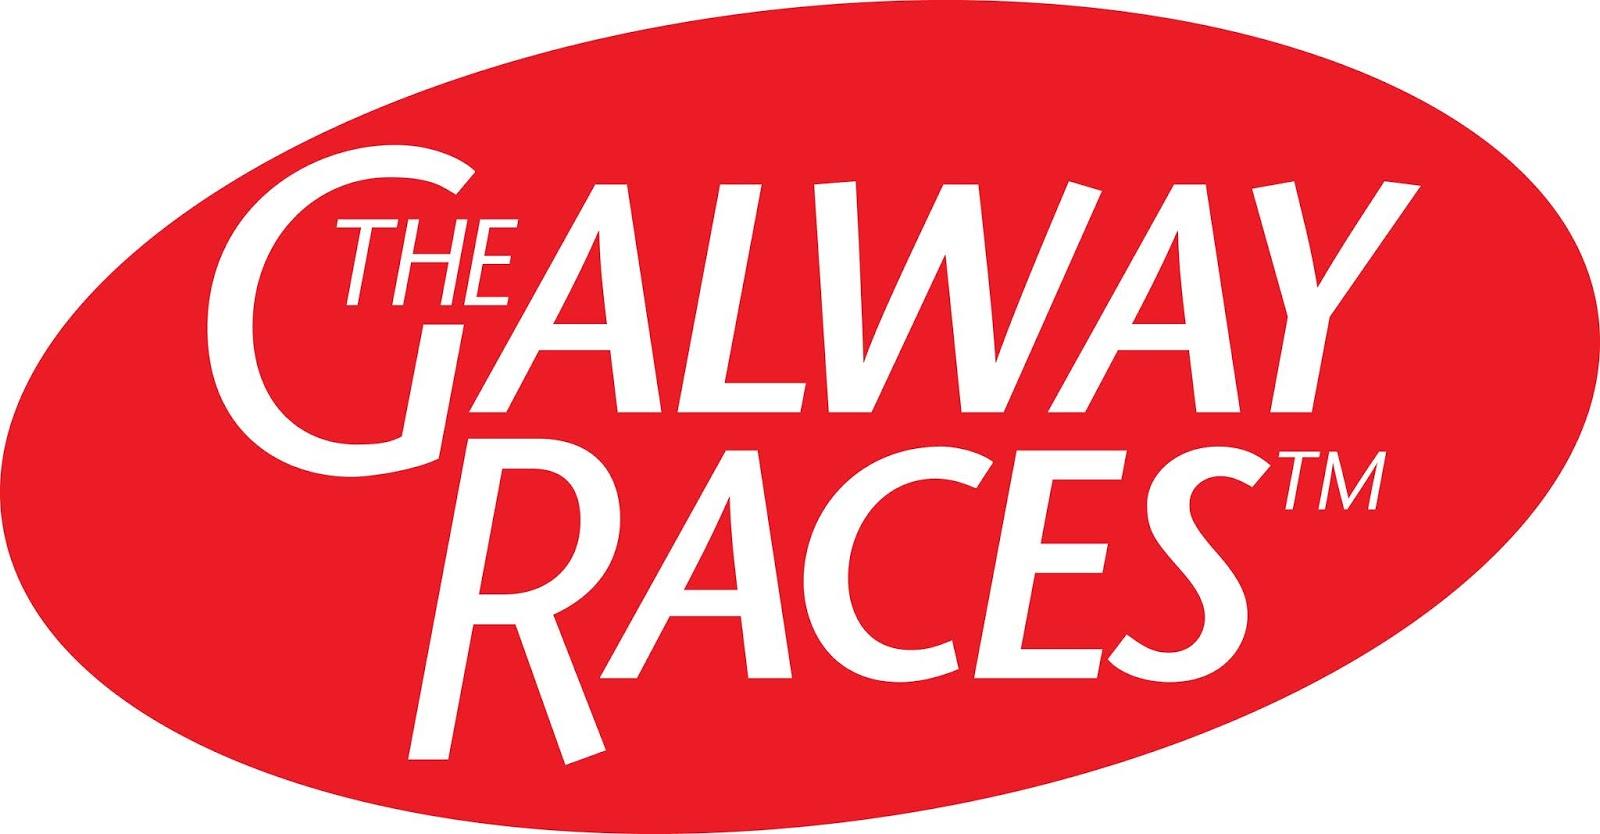 Map Of Ireland Racecourses.Irish Racecourses Irish Racecourses Galway